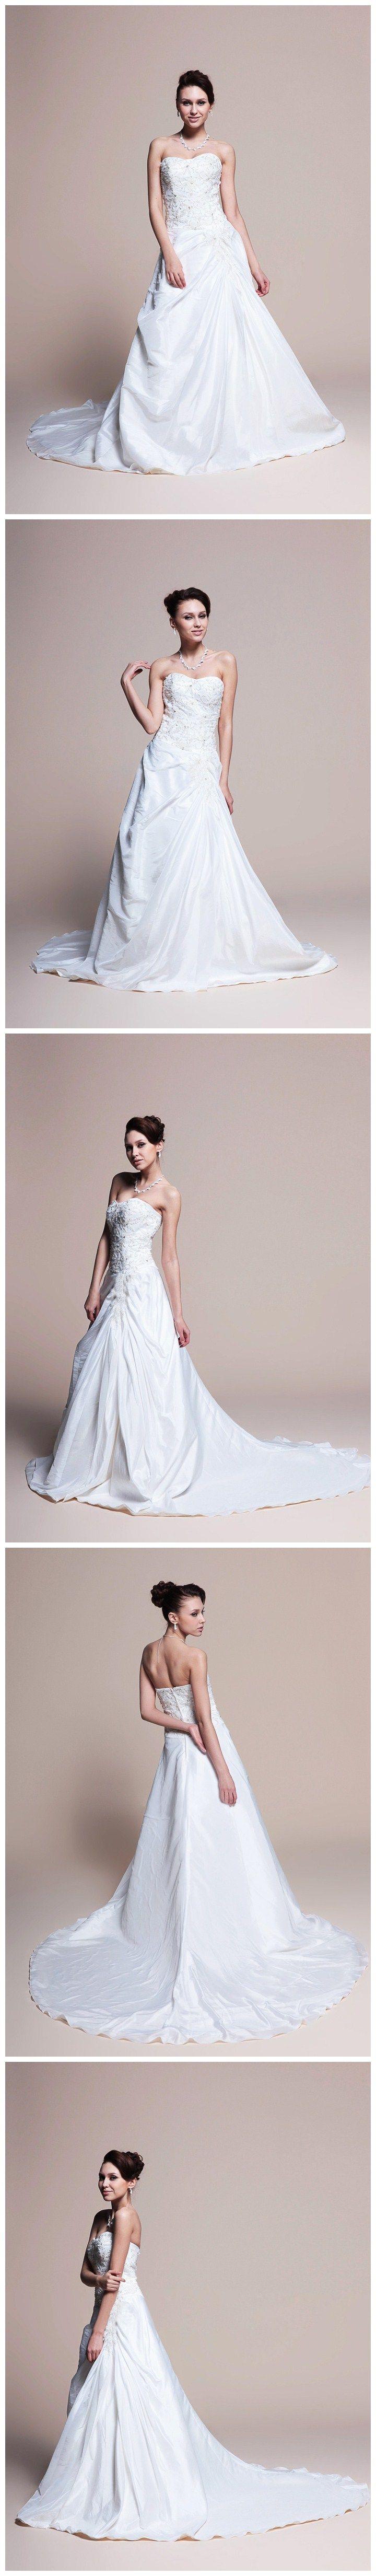 Taffeta A-Line Wedding Dress With Beaded Bodice